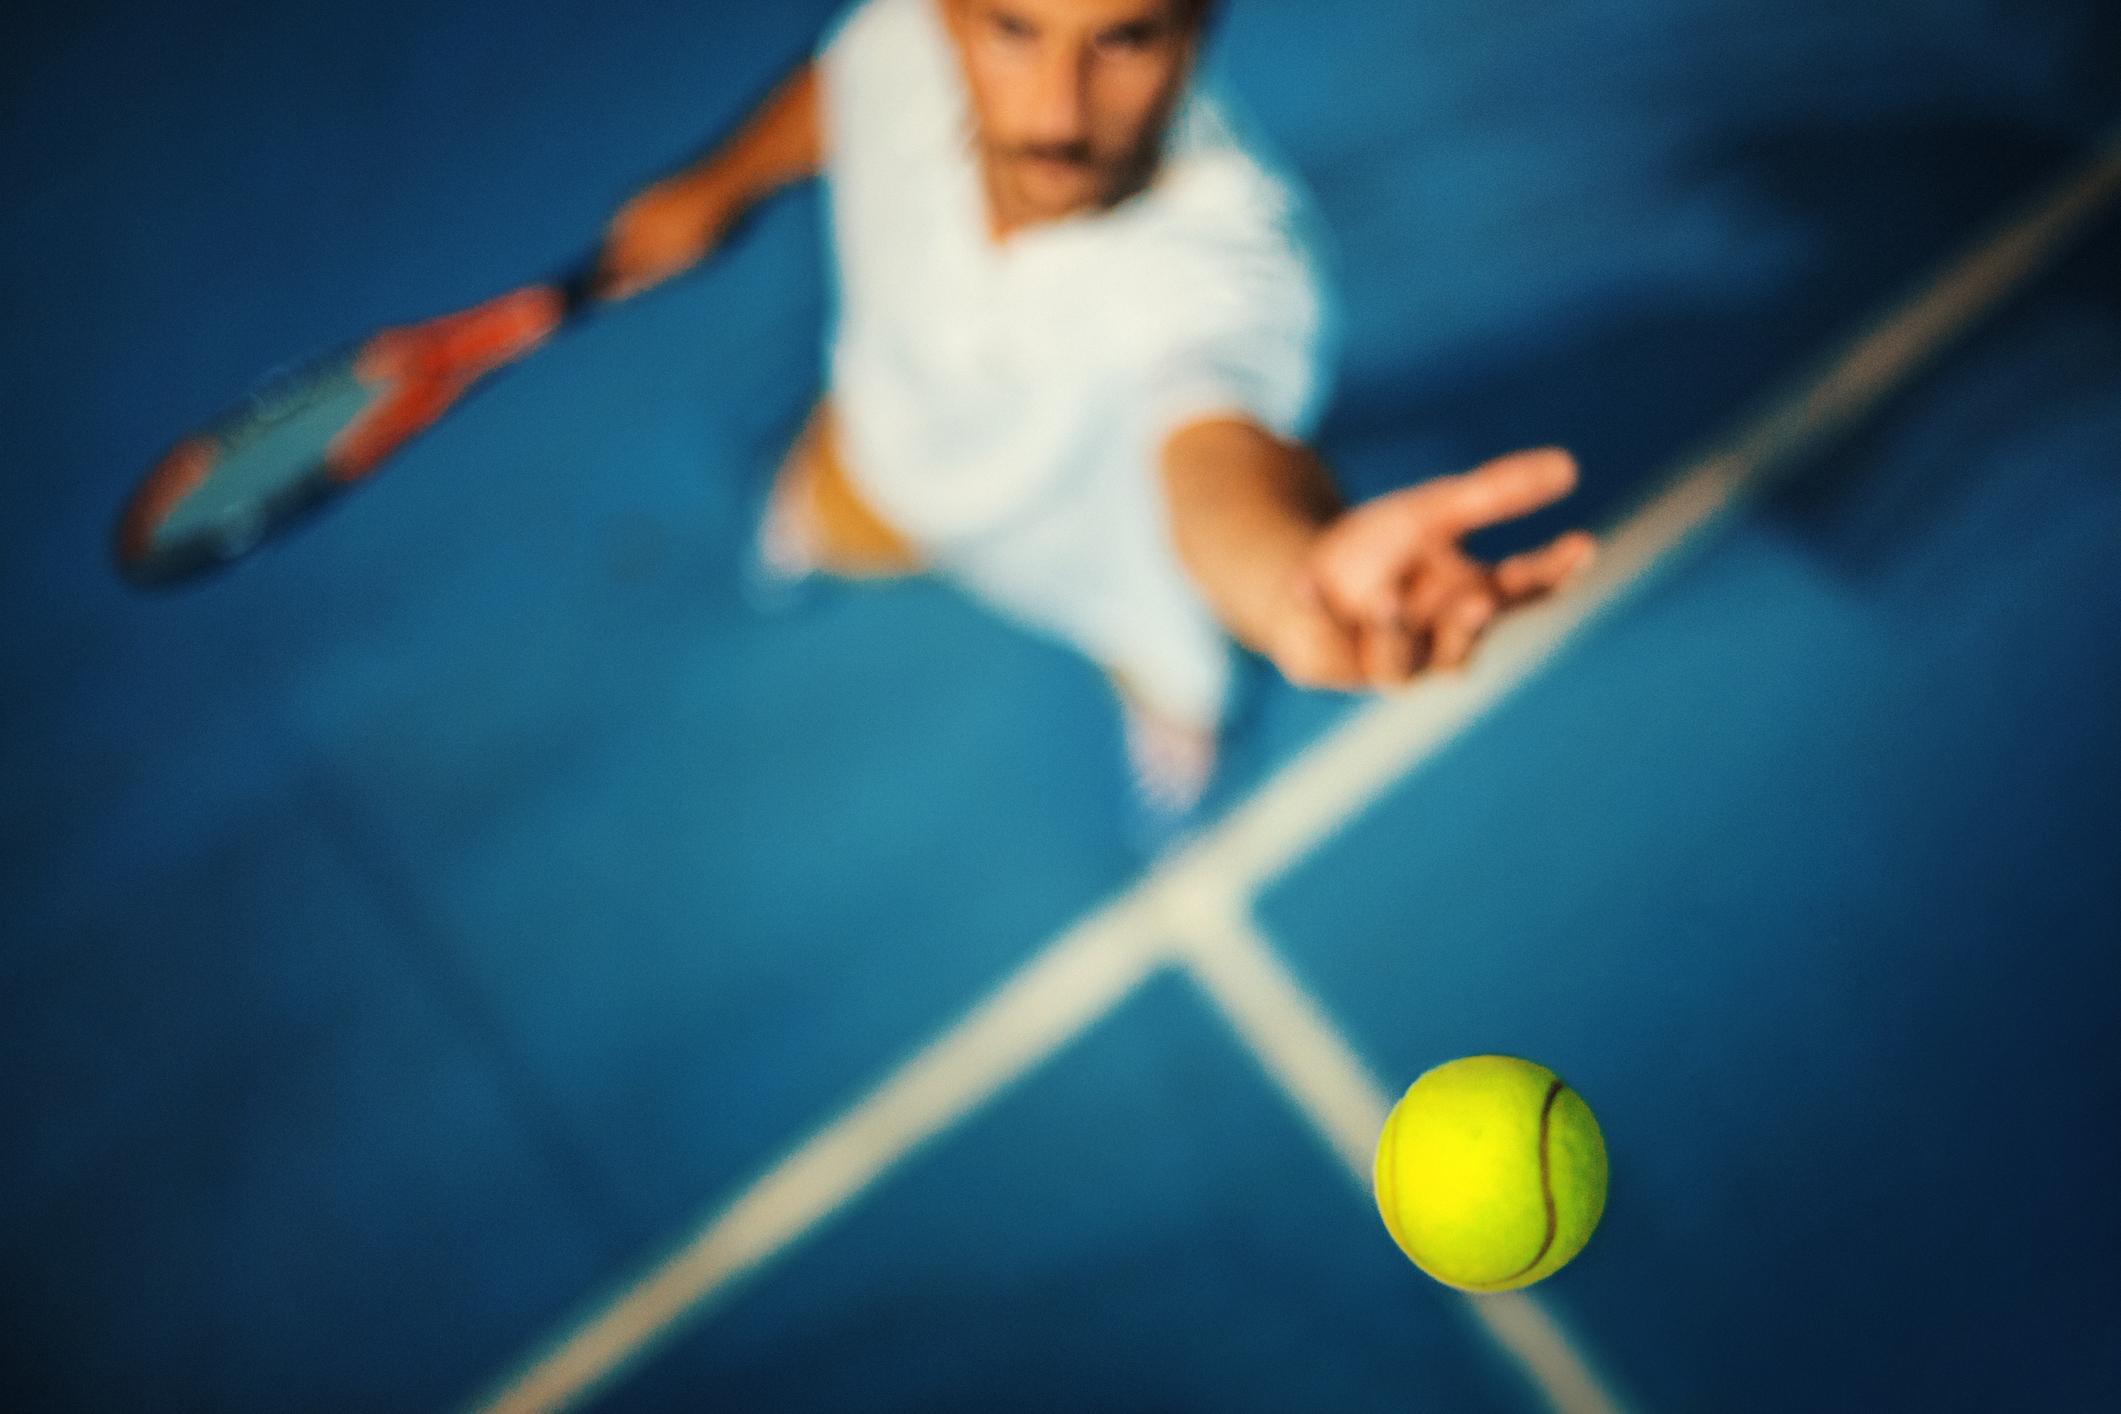 Taylor Tennis